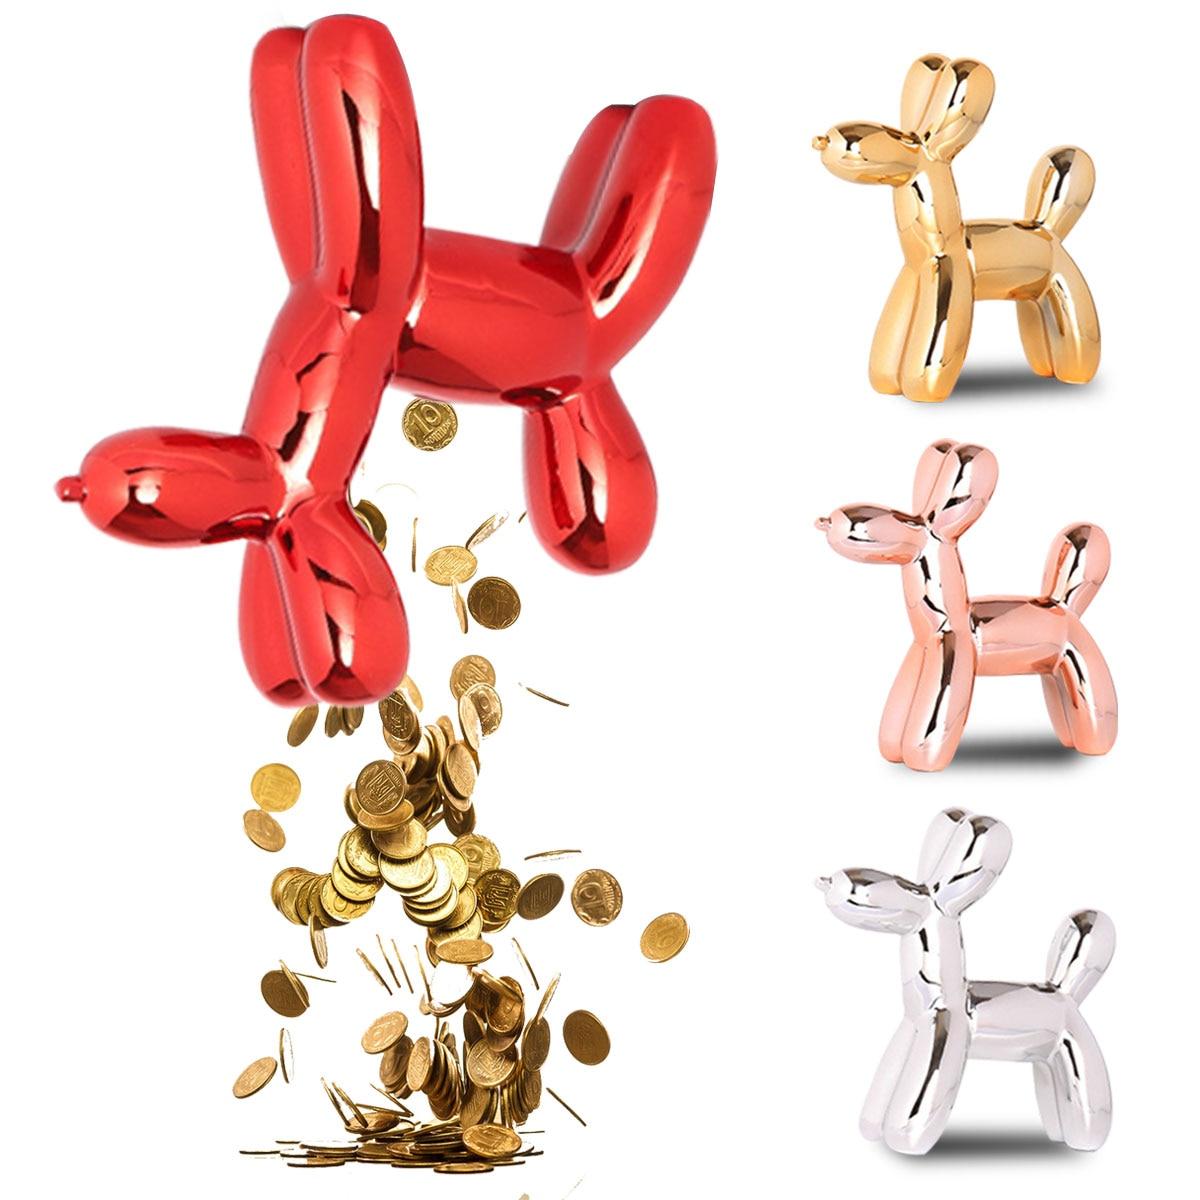 4 Color Balloon Dog Counting Coin Money Saving Box Jar